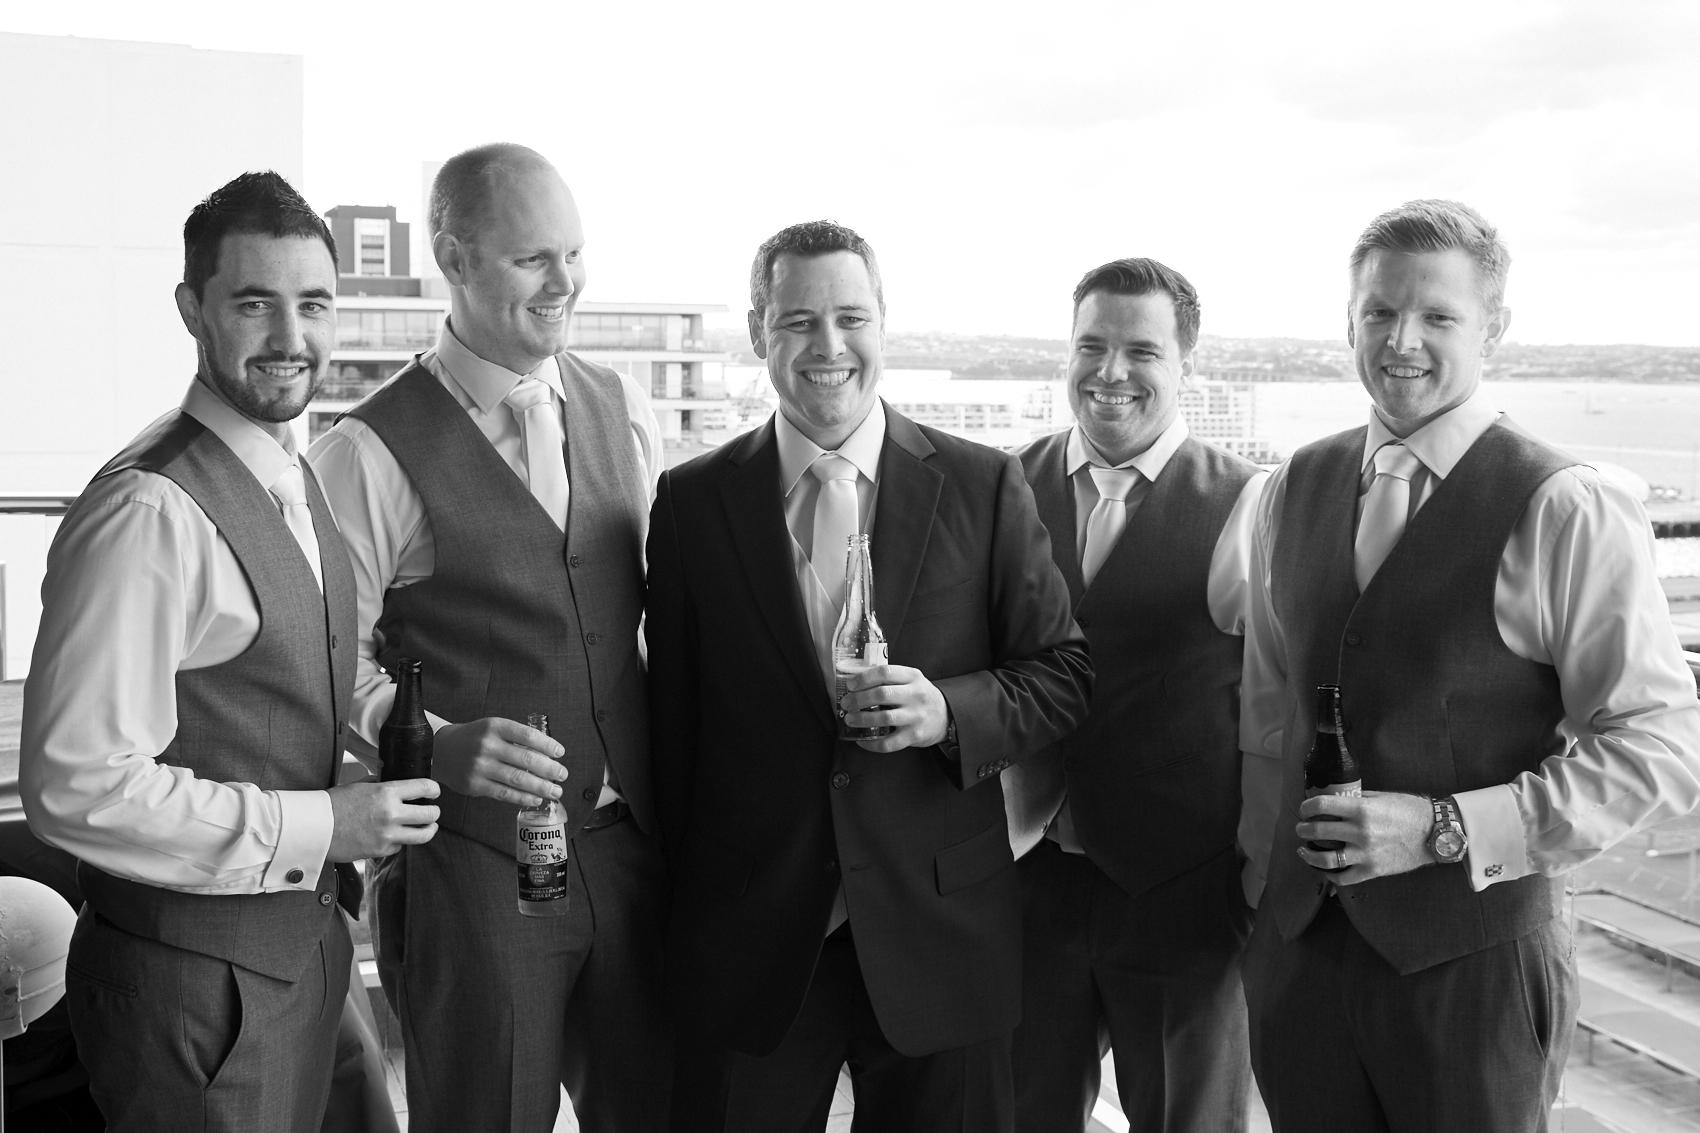 The men smiling